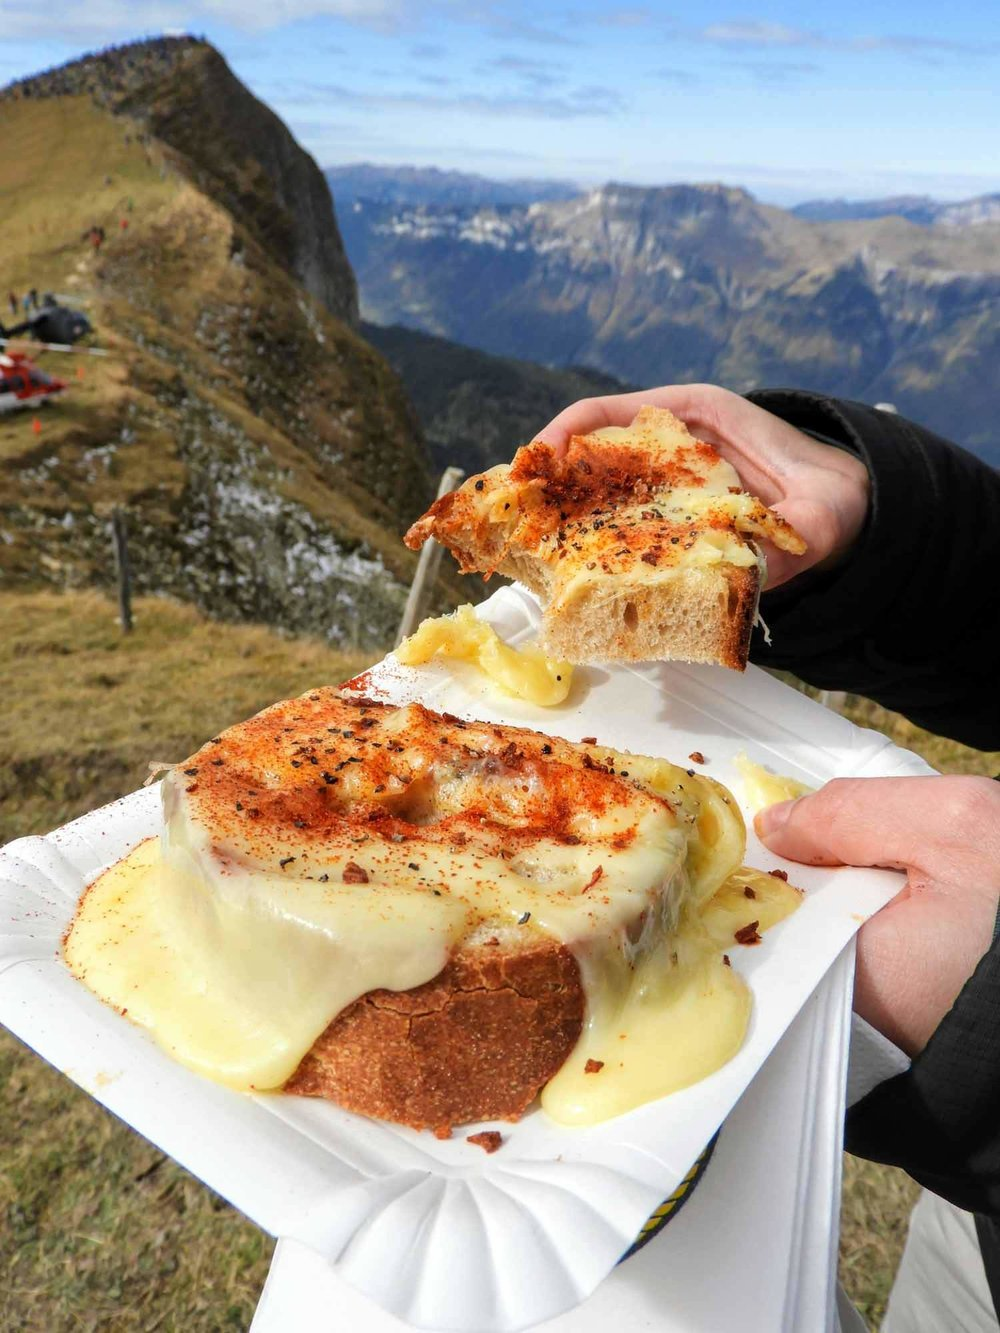 switzerland-axalp-raclette-cheese-sandwich.jpg